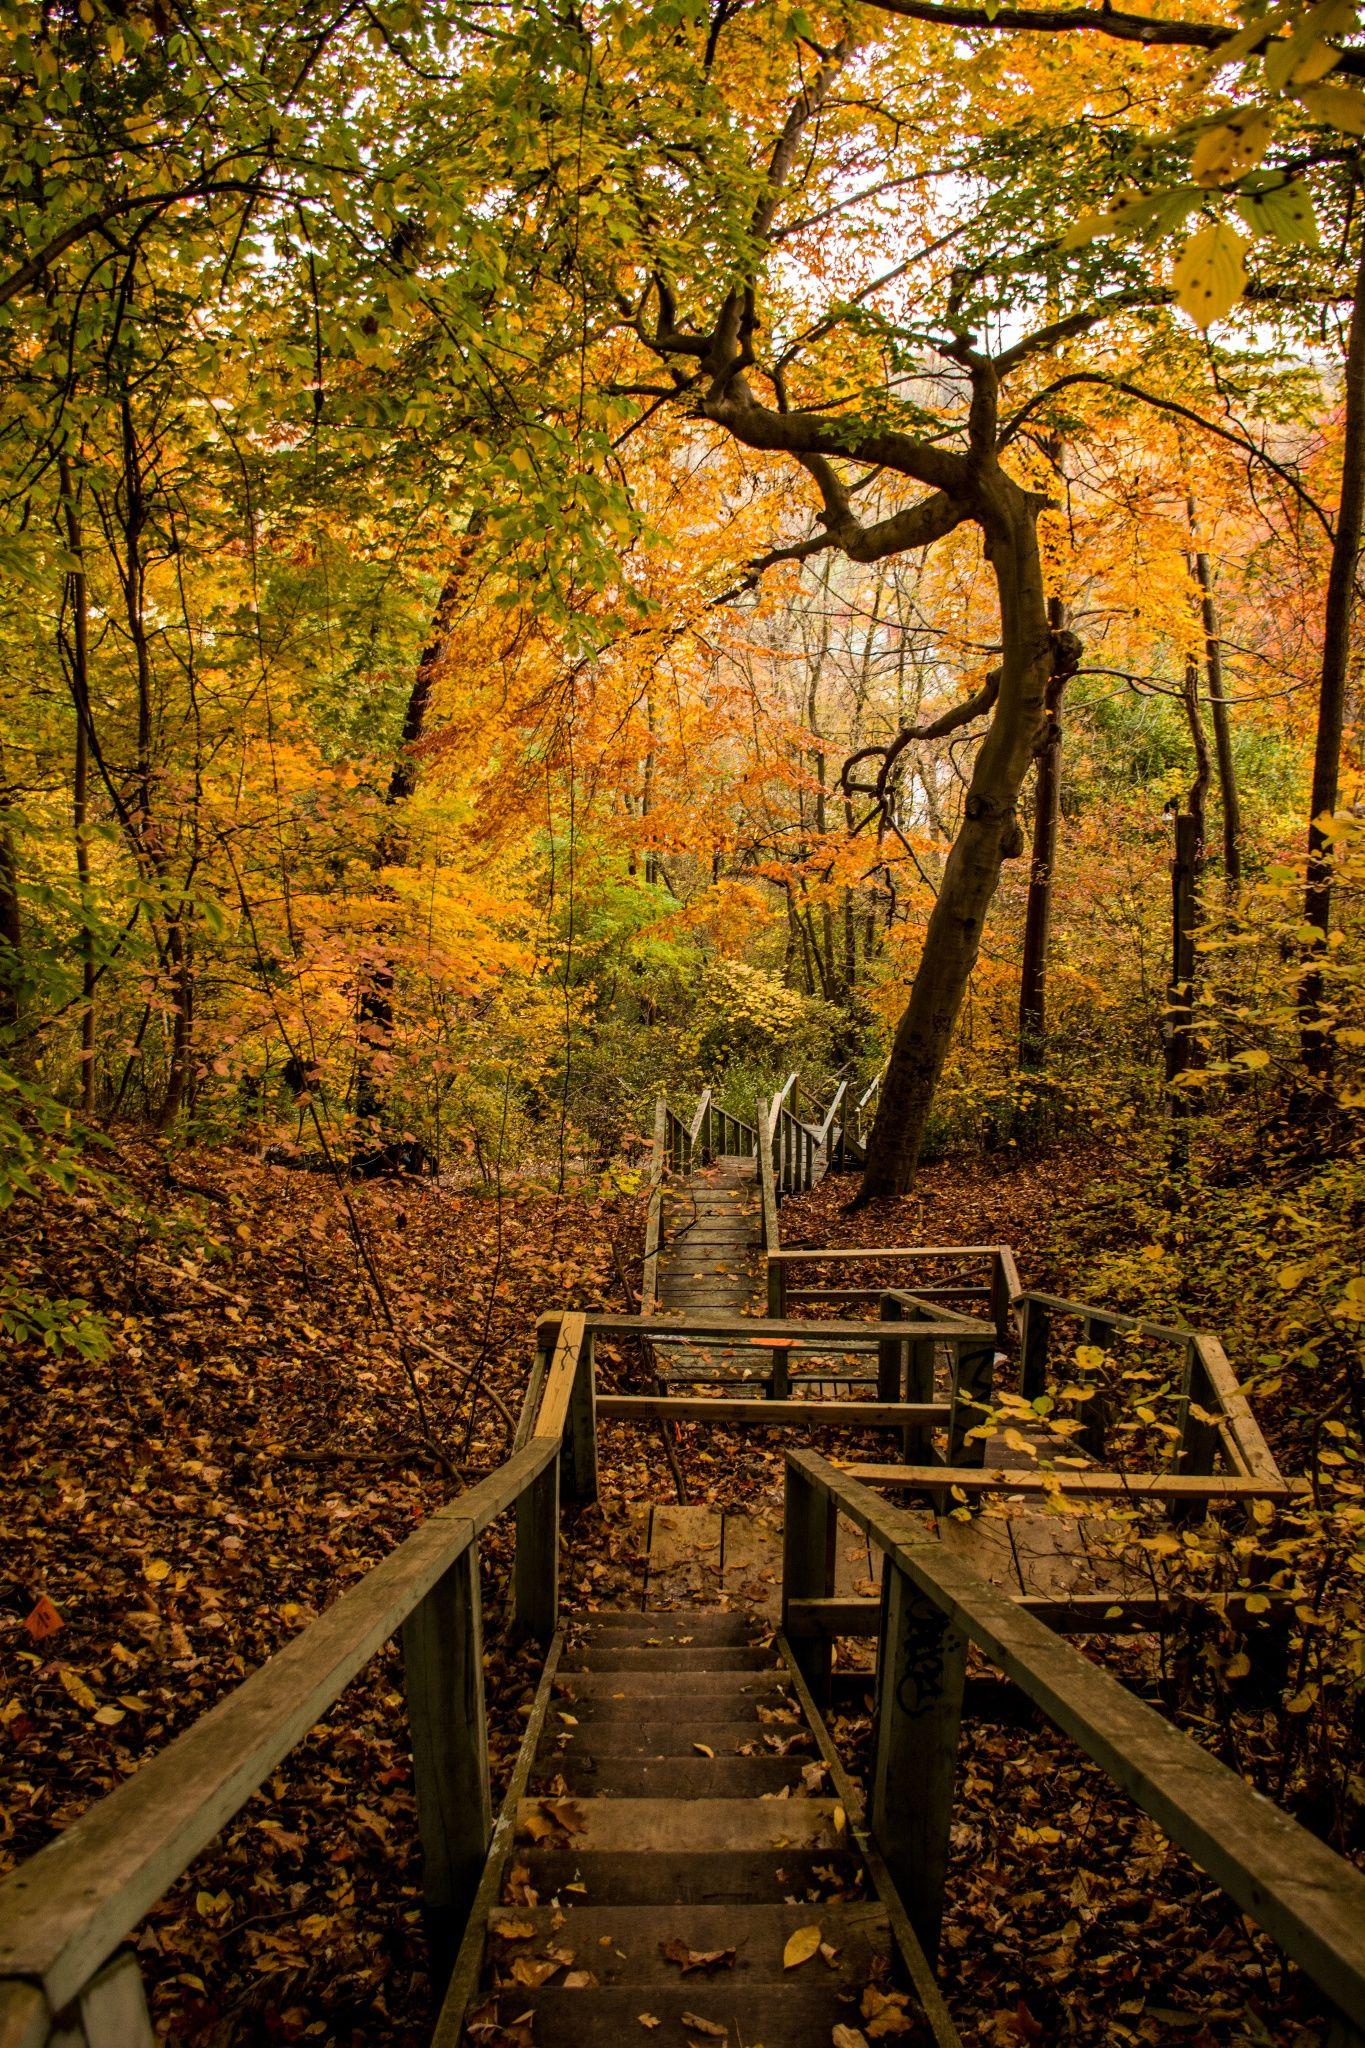 Autumn has reached Toronto. Autumn scenery, Golden